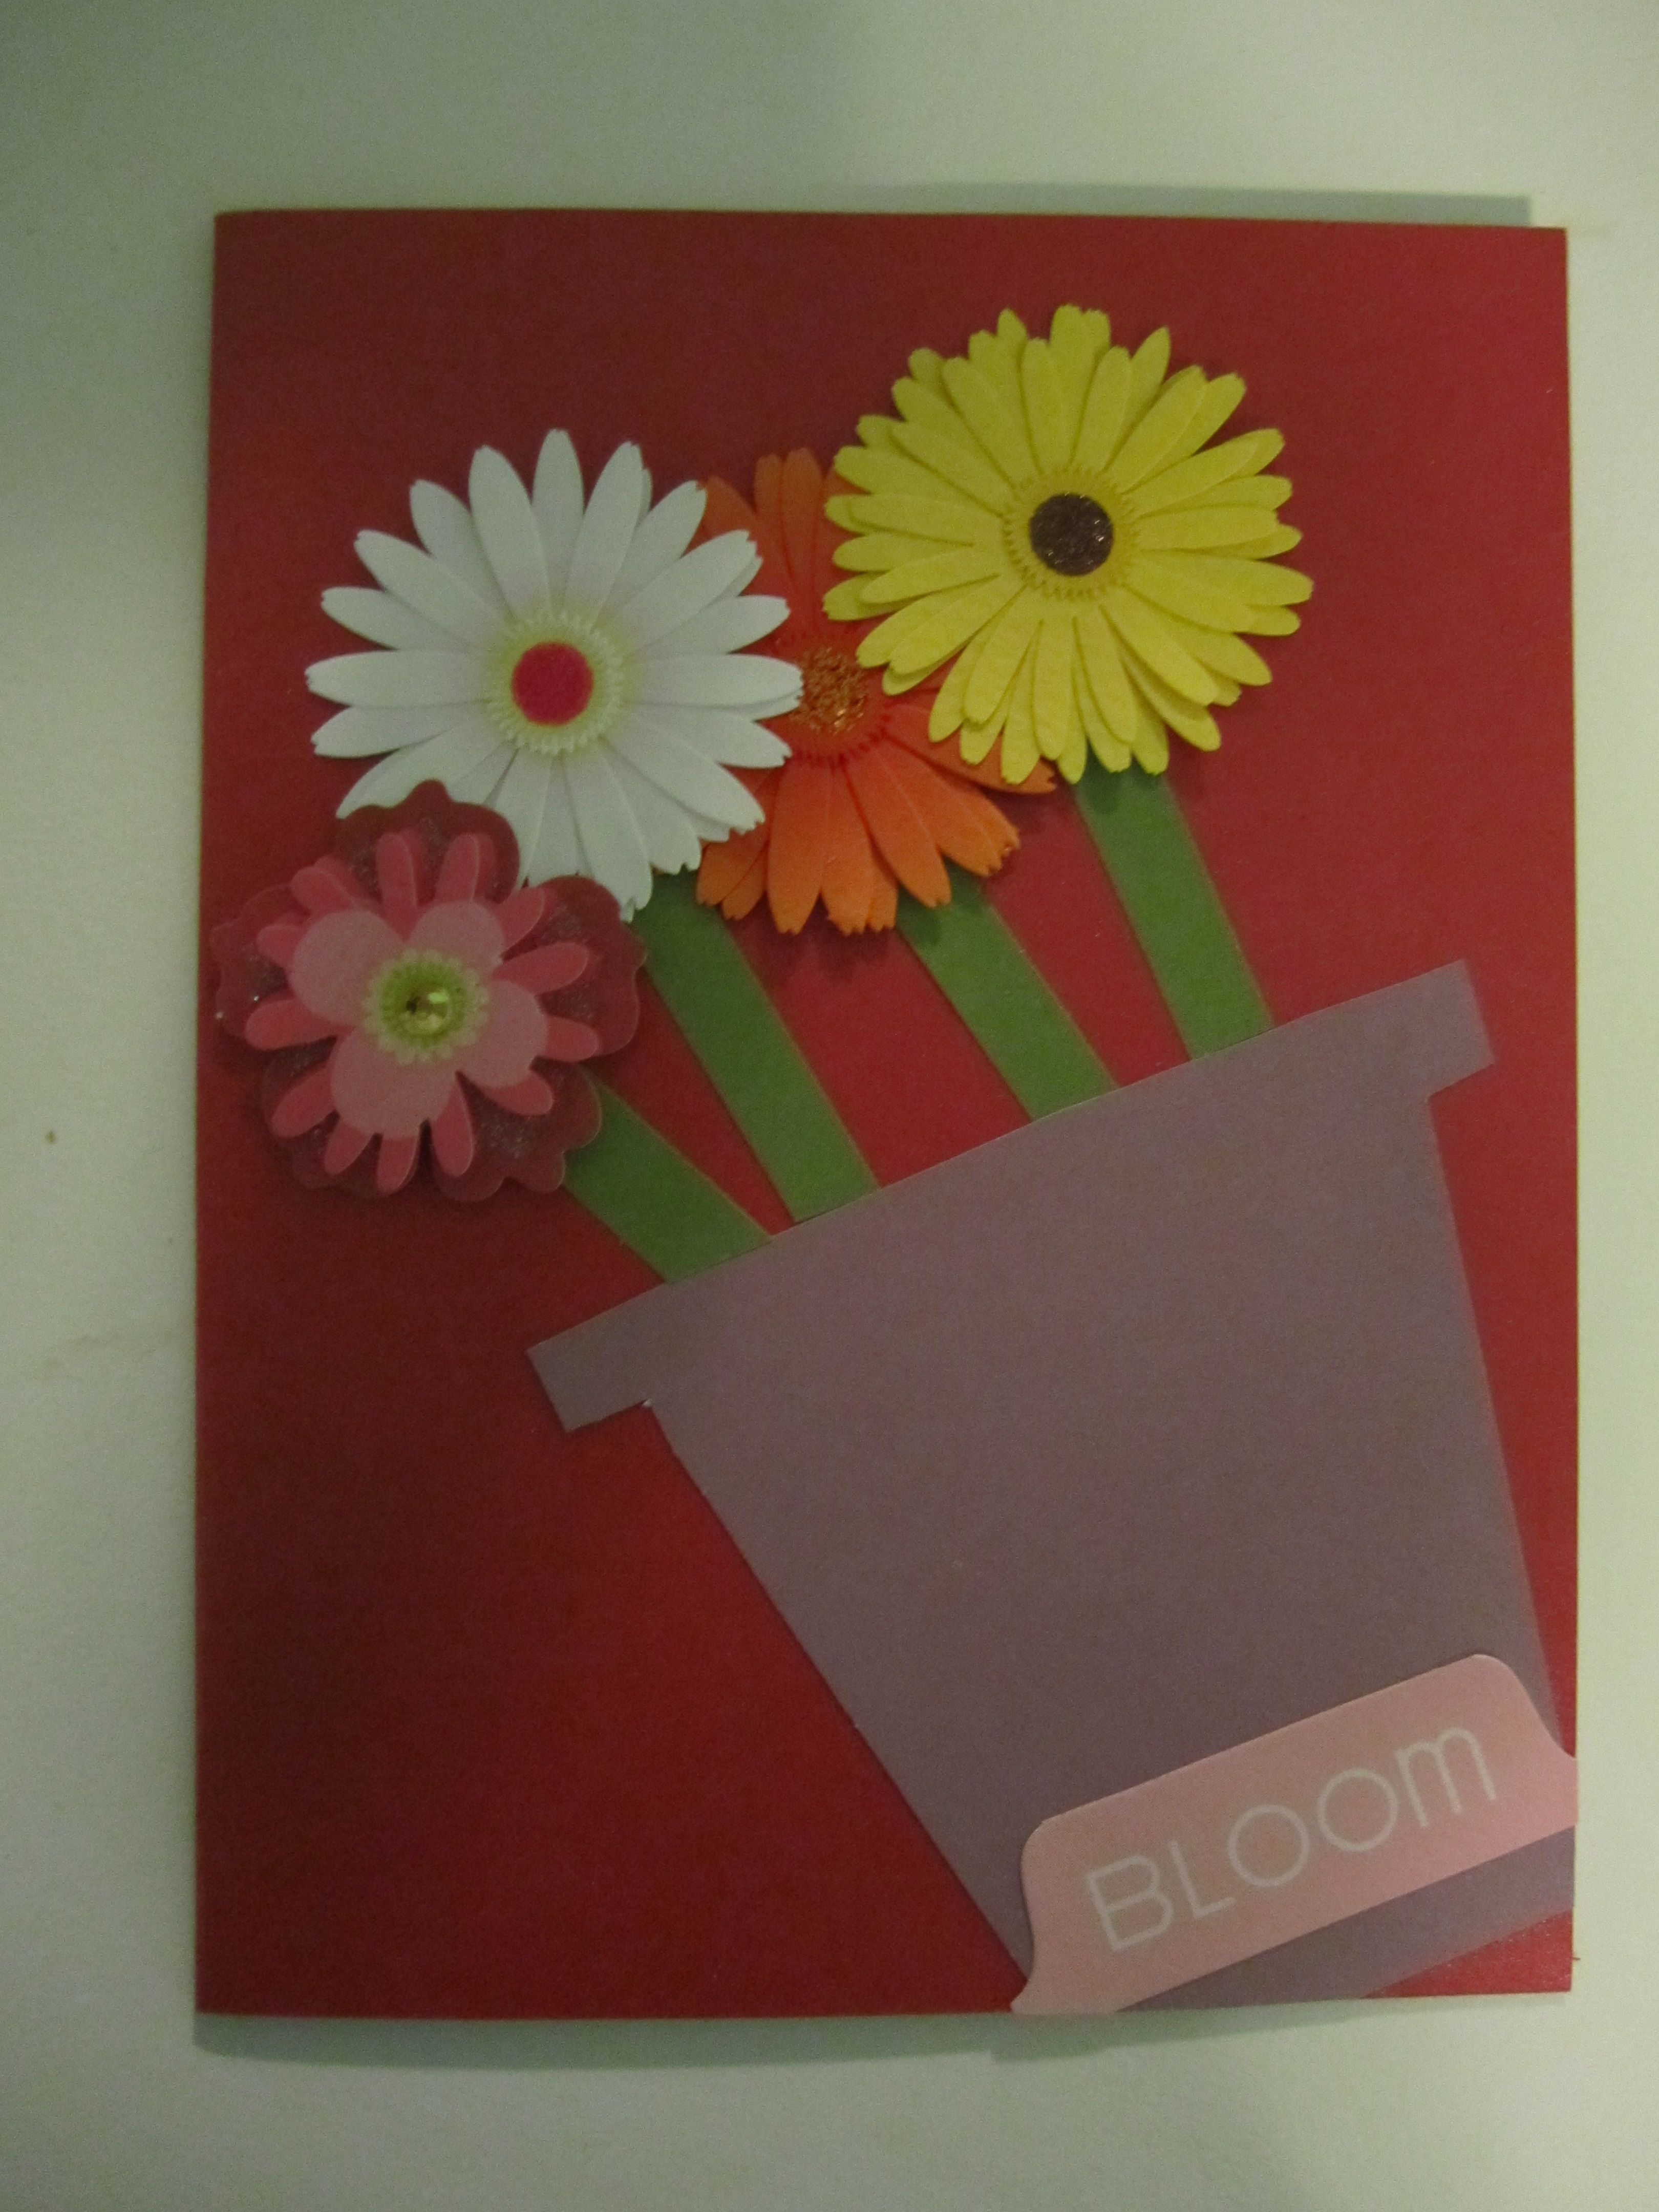 Pinterest handmade greeting cards just b cause for Handmade christmas cards pinterest